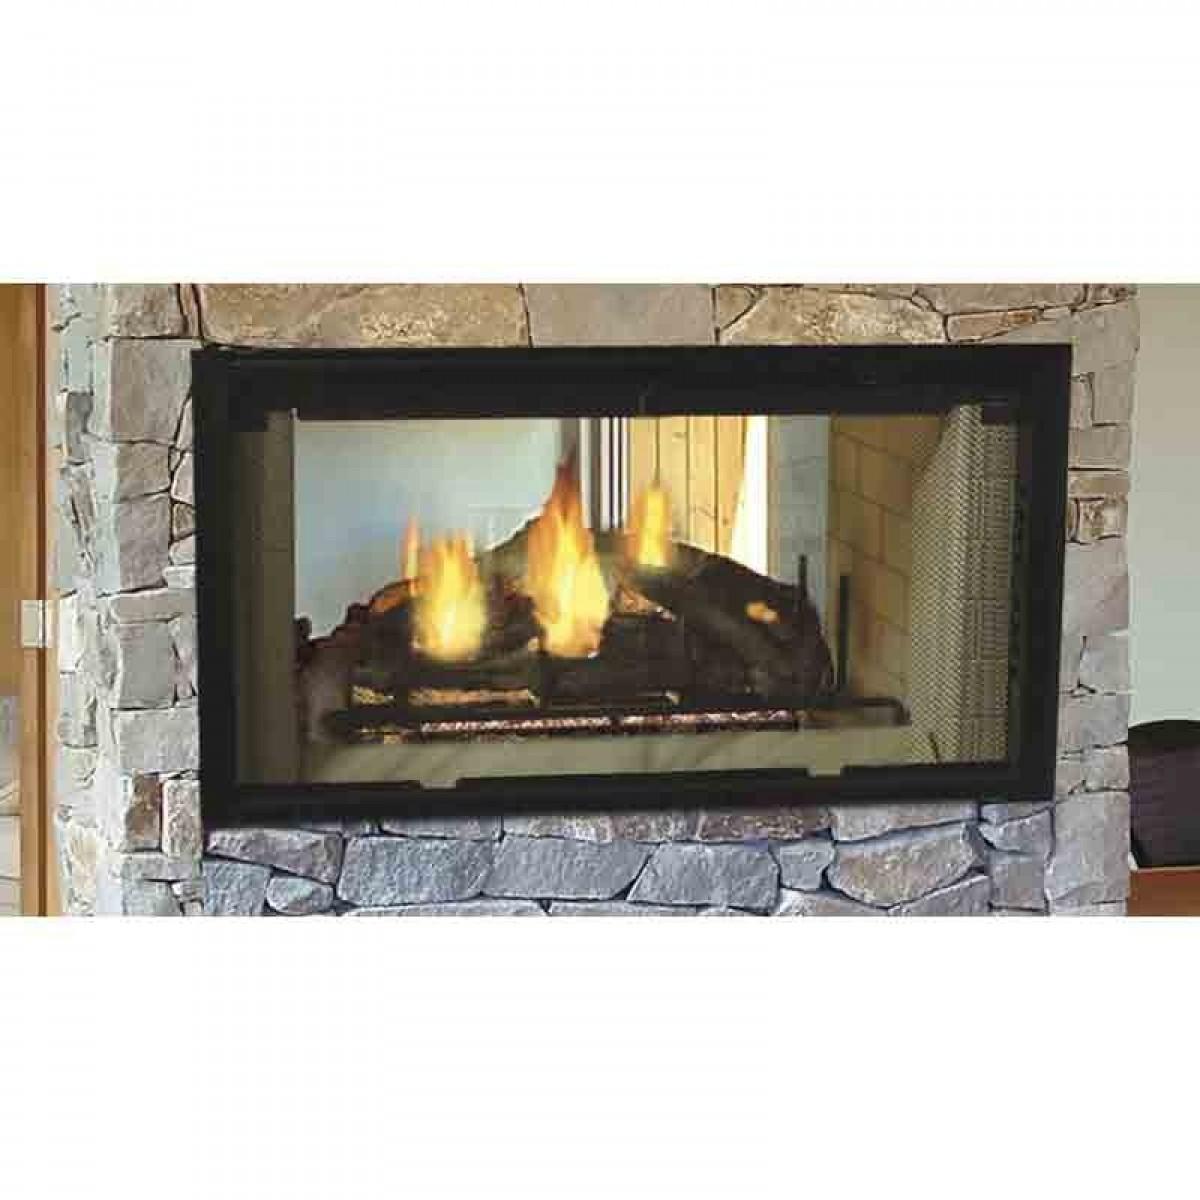 Majestic Designer SeeThrough Wood Burning Fireplace